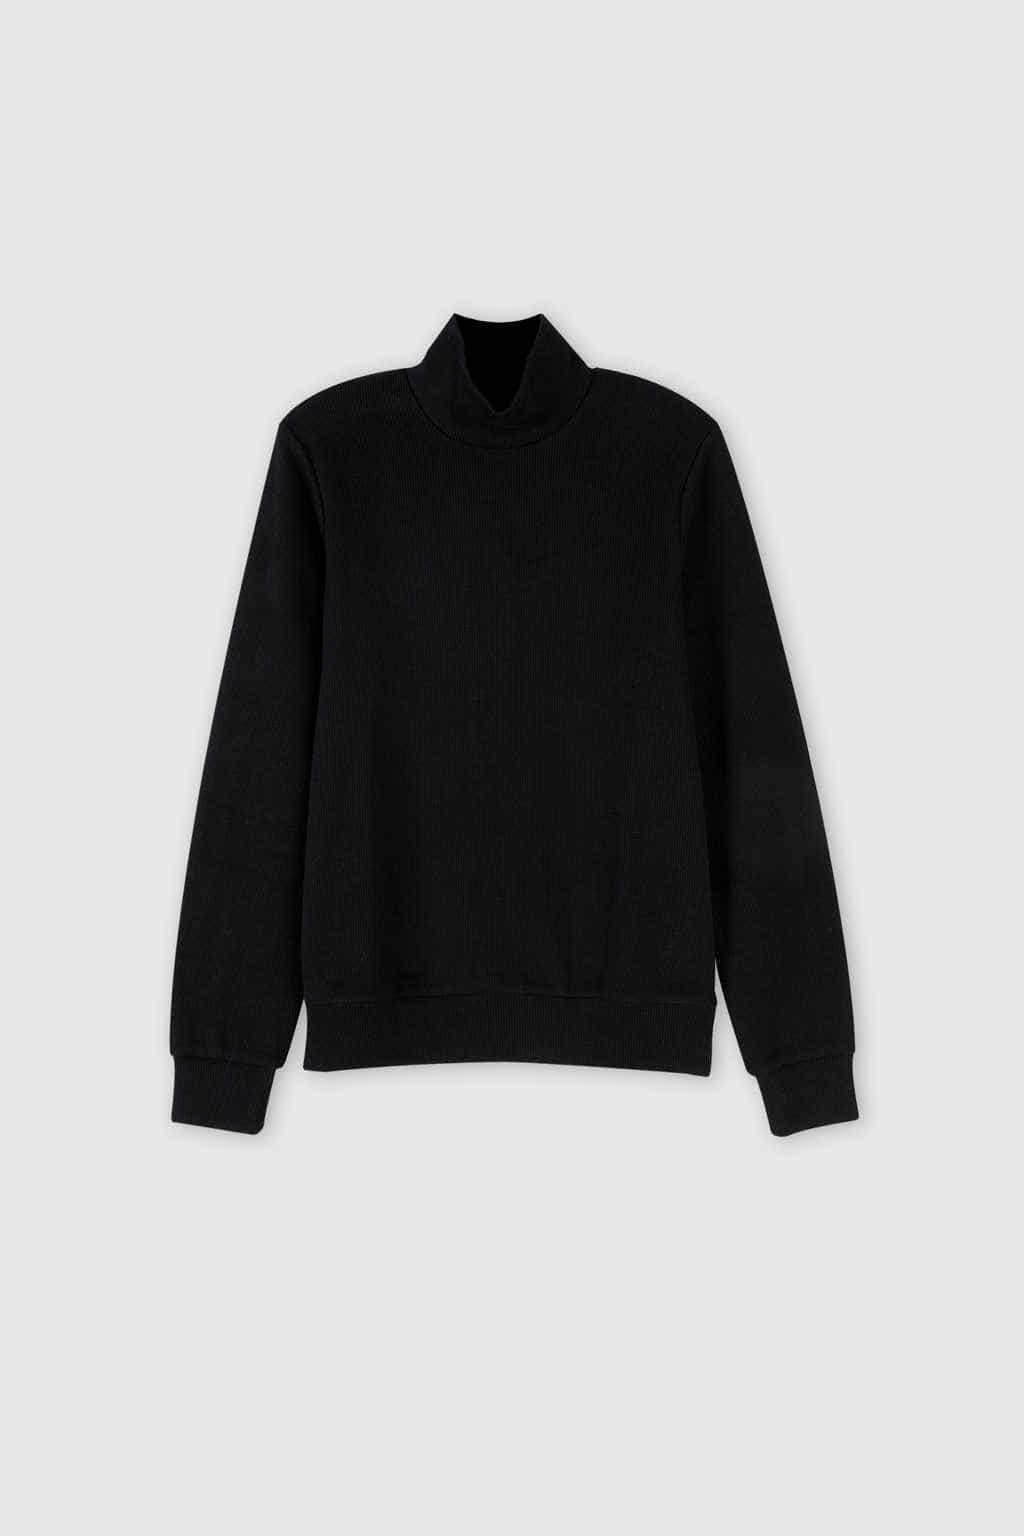 Sweatshirt 2667 Black 11